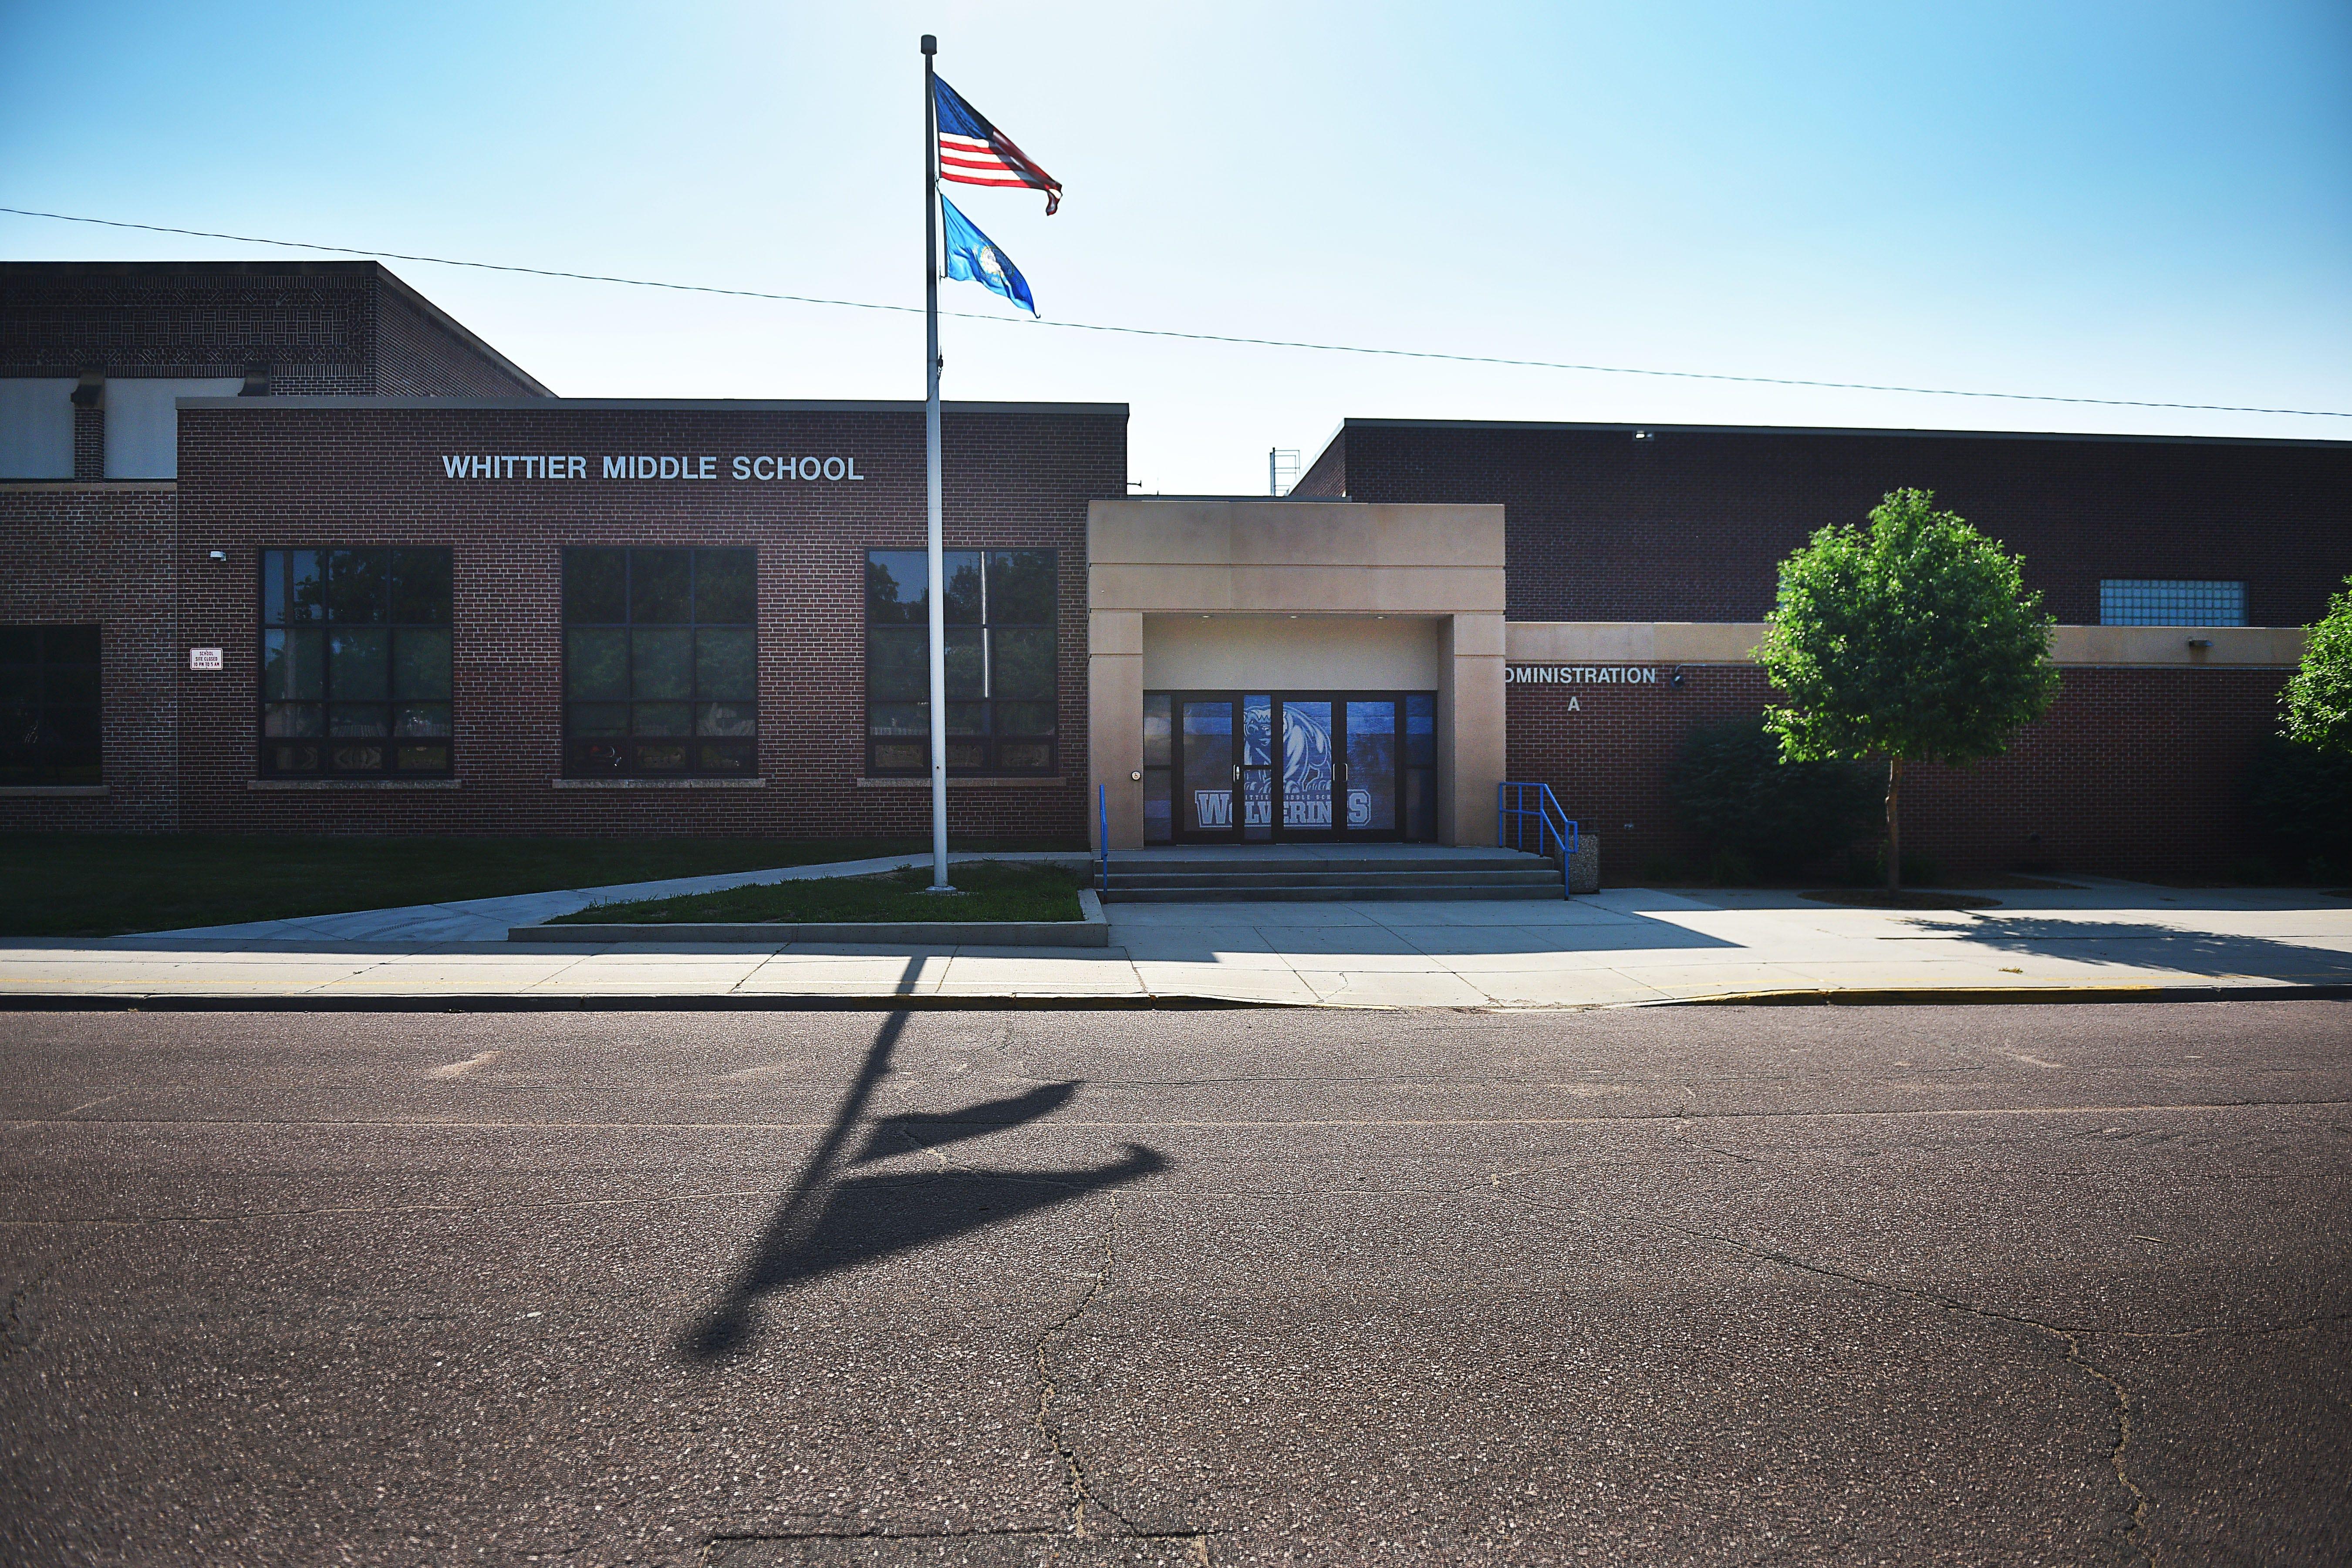 Whitter Middle School South Dakota